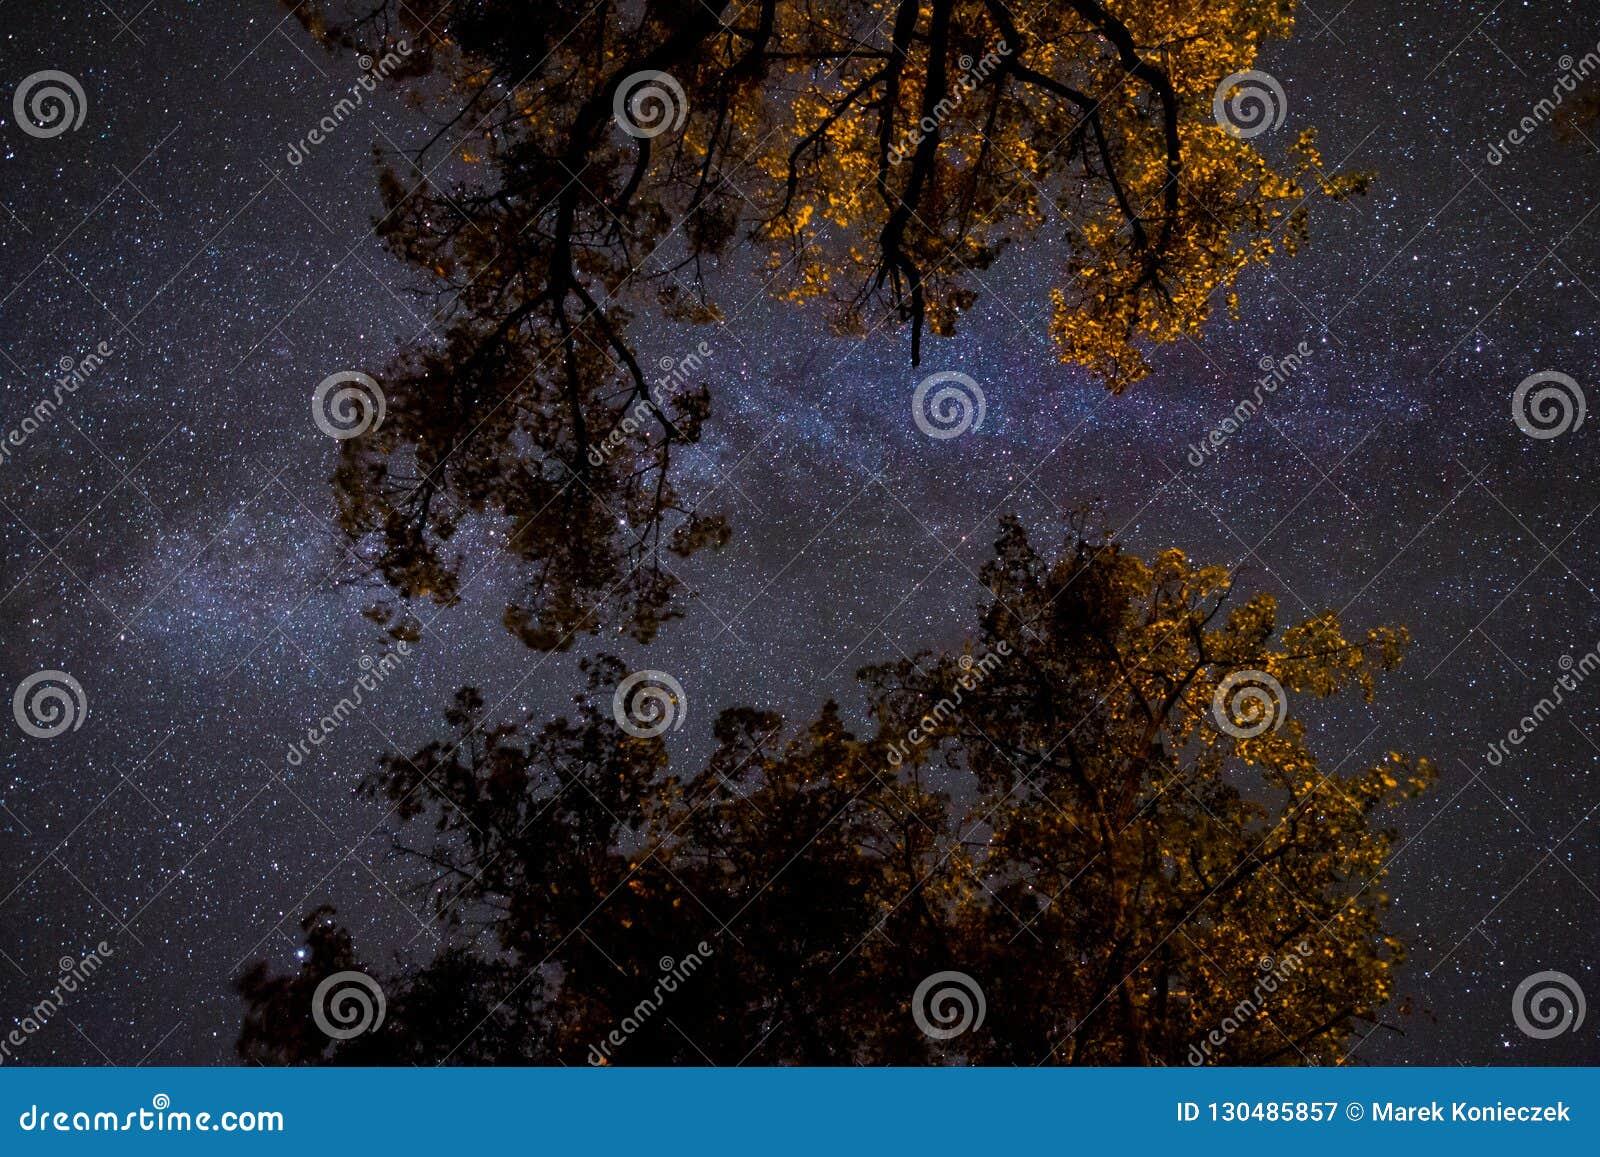 Droga Mleczna nad korona drzewa